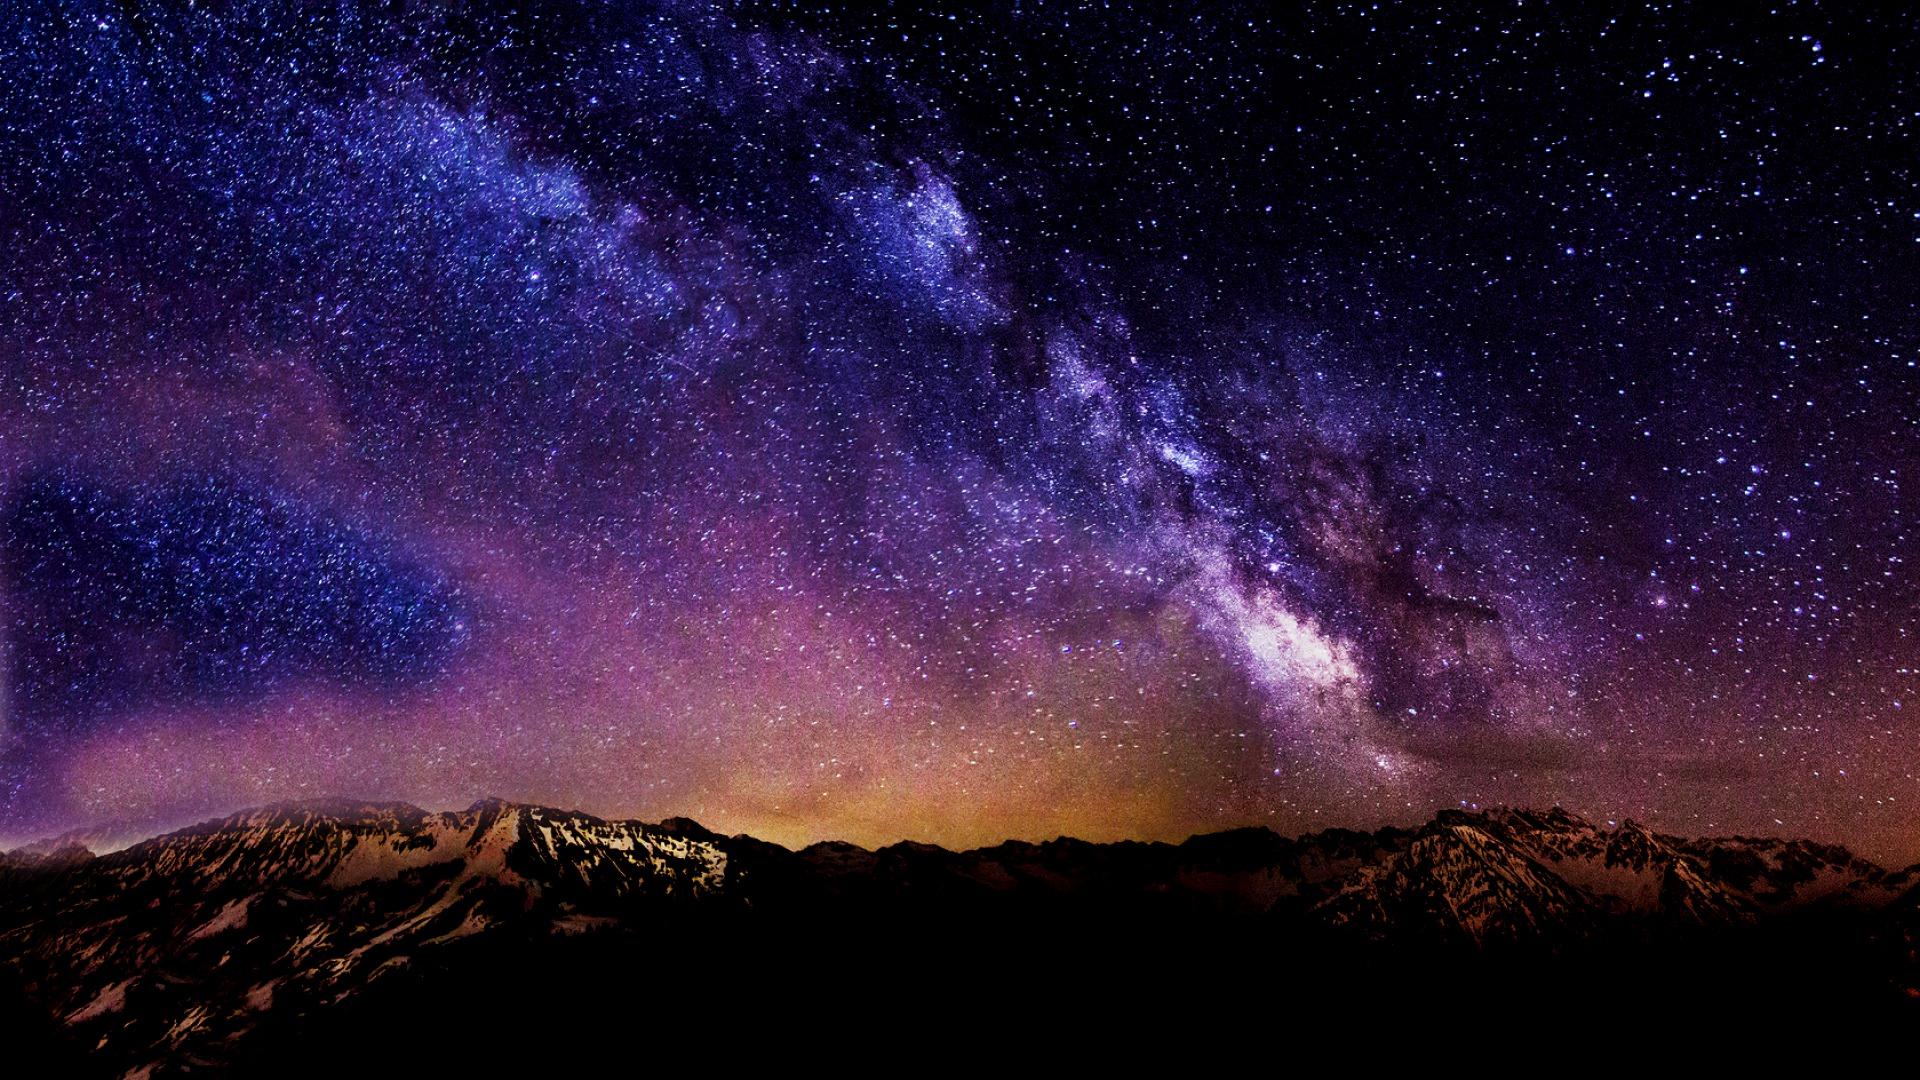 starry night sky wallpaper - photo #22